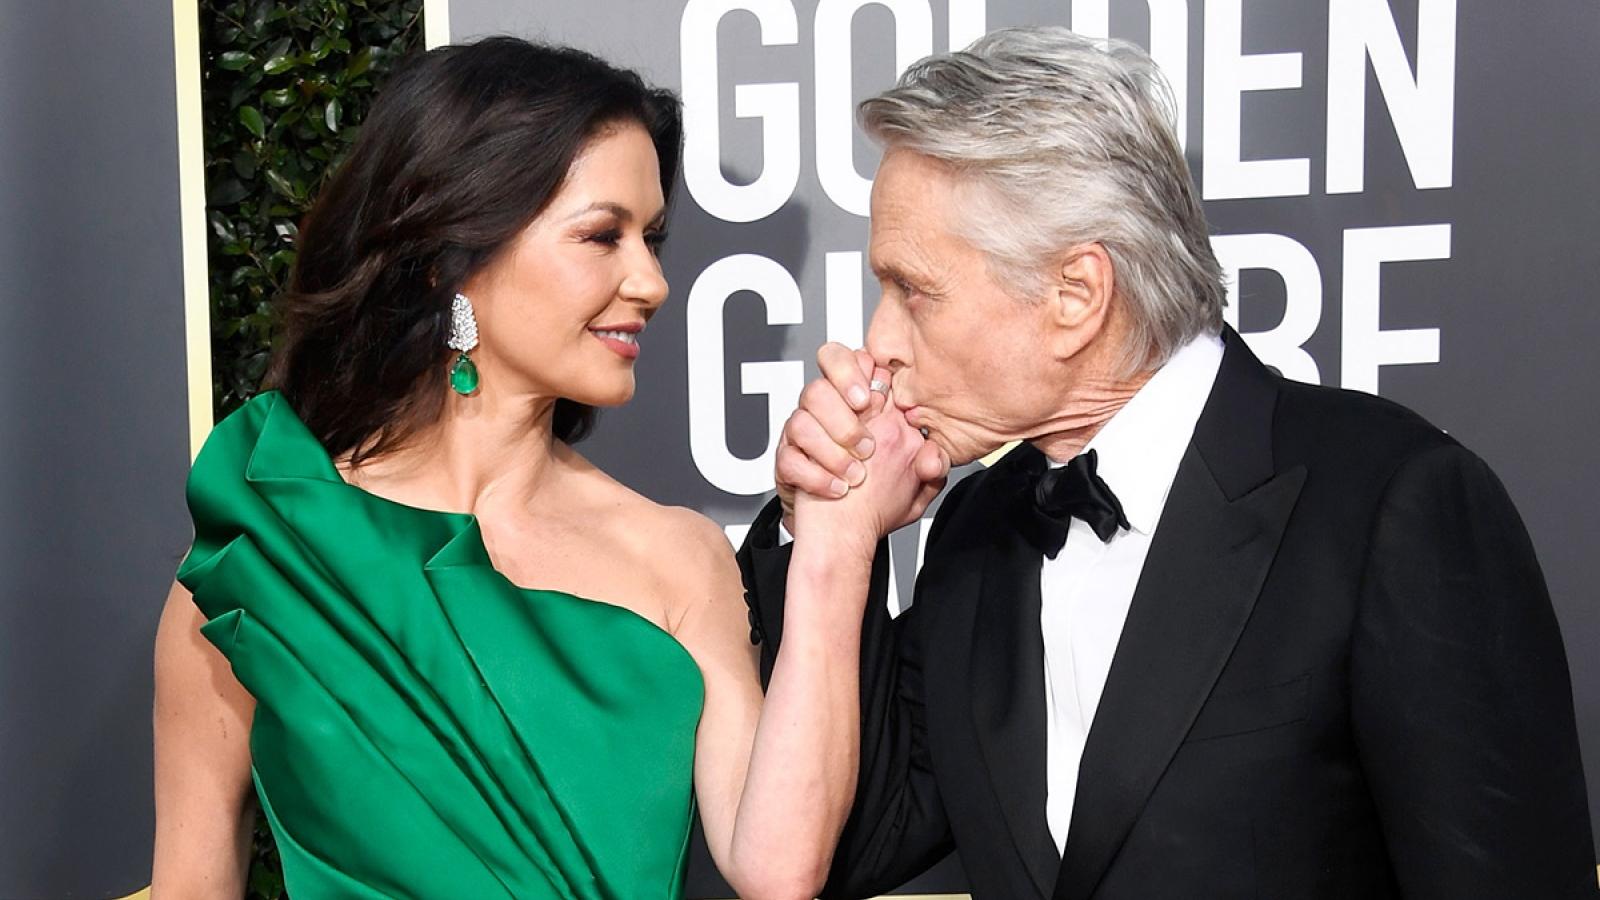 Tình yêu bất chấp tuổi tác của Catherine Zeta-Jones và Michael Douglas